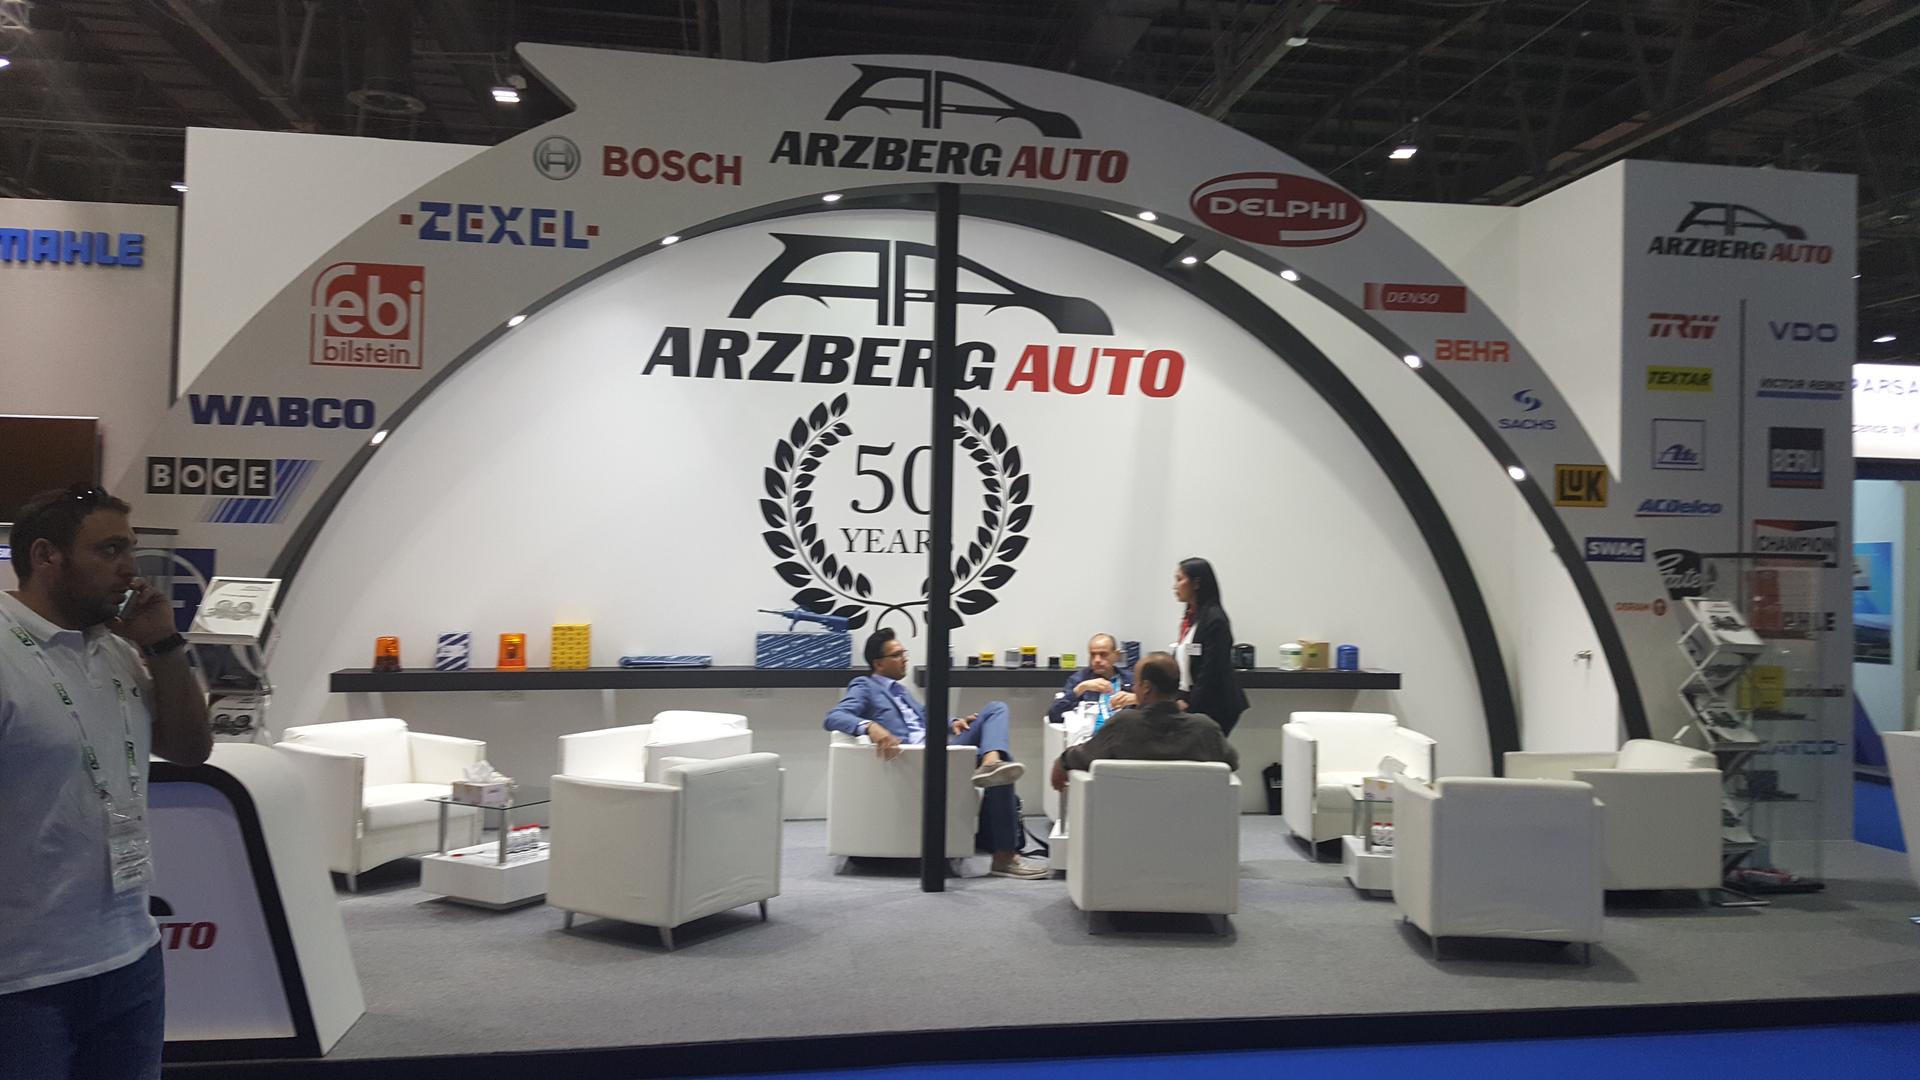 Arzberg Auto GmbH - Auto Parts Germany, Bosch Auto Parts, Auto Parts